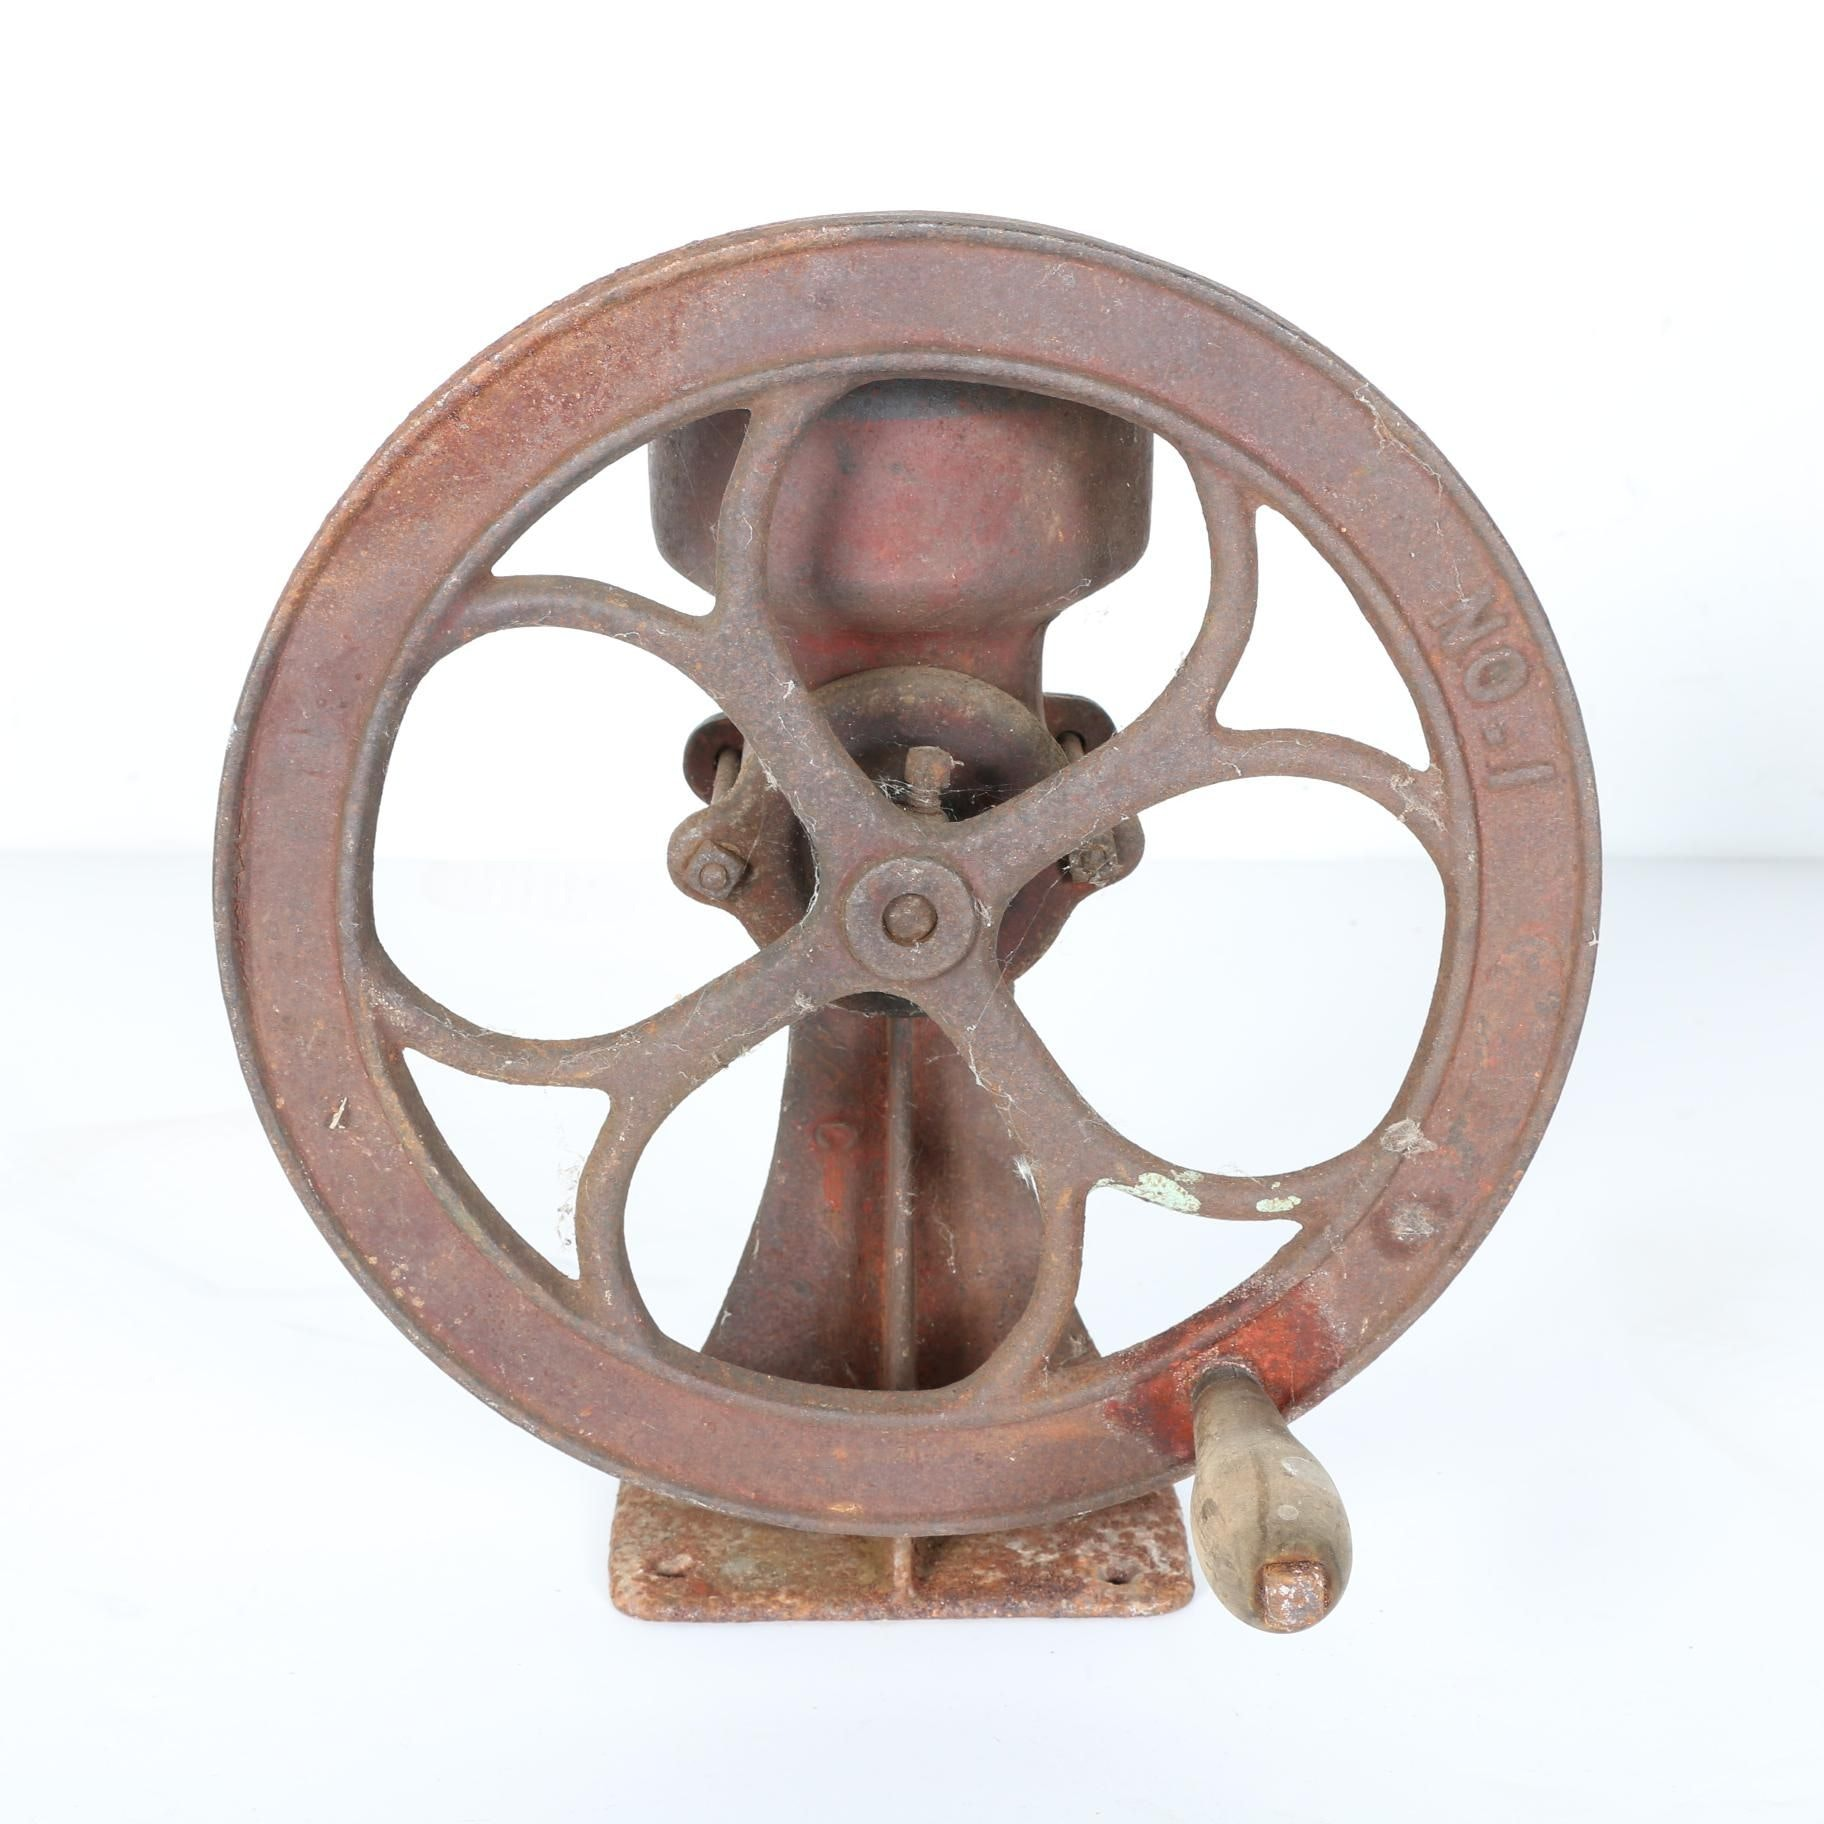 Antique Cast Iron Grinding Wheel